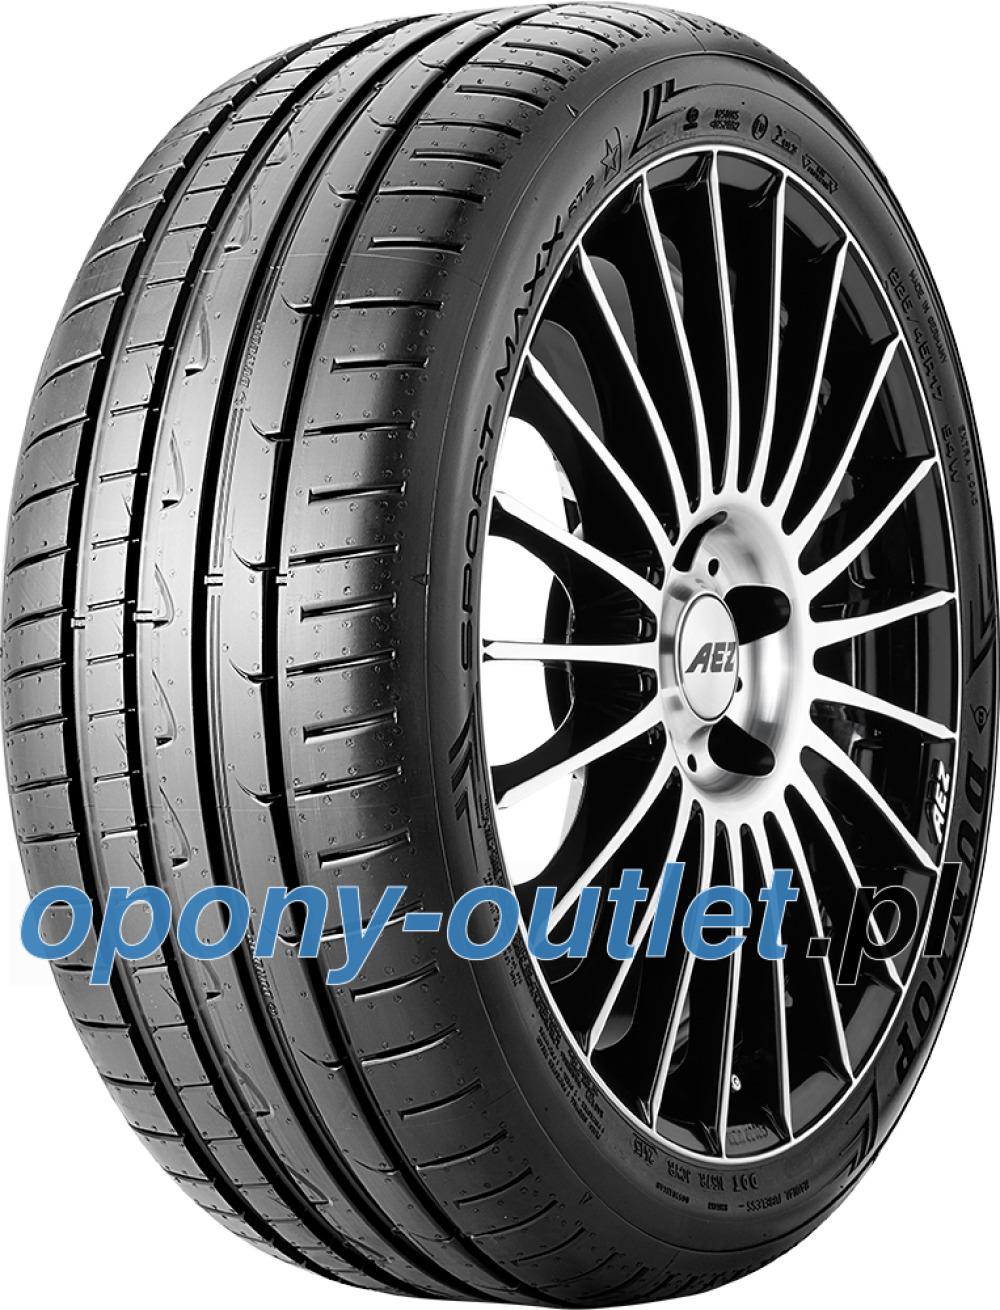 Dunlop Sport Maxx RT2 ( 205/40 R18 86Y XL osłona felgi (MFS) )